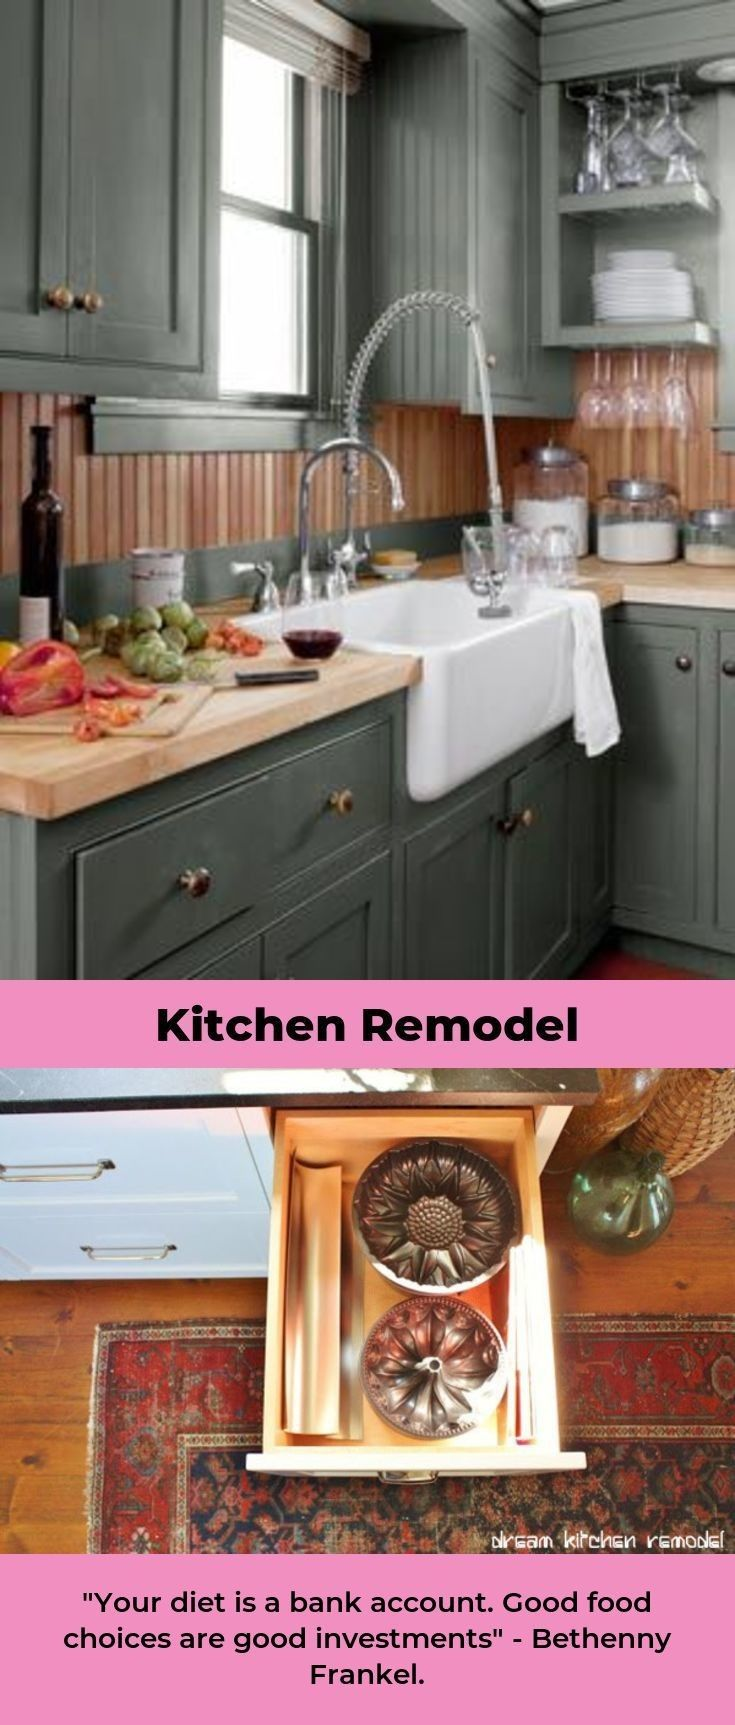 budget kitchen remodel new kitchen ideas budget kitchen remodel rh pinterest com